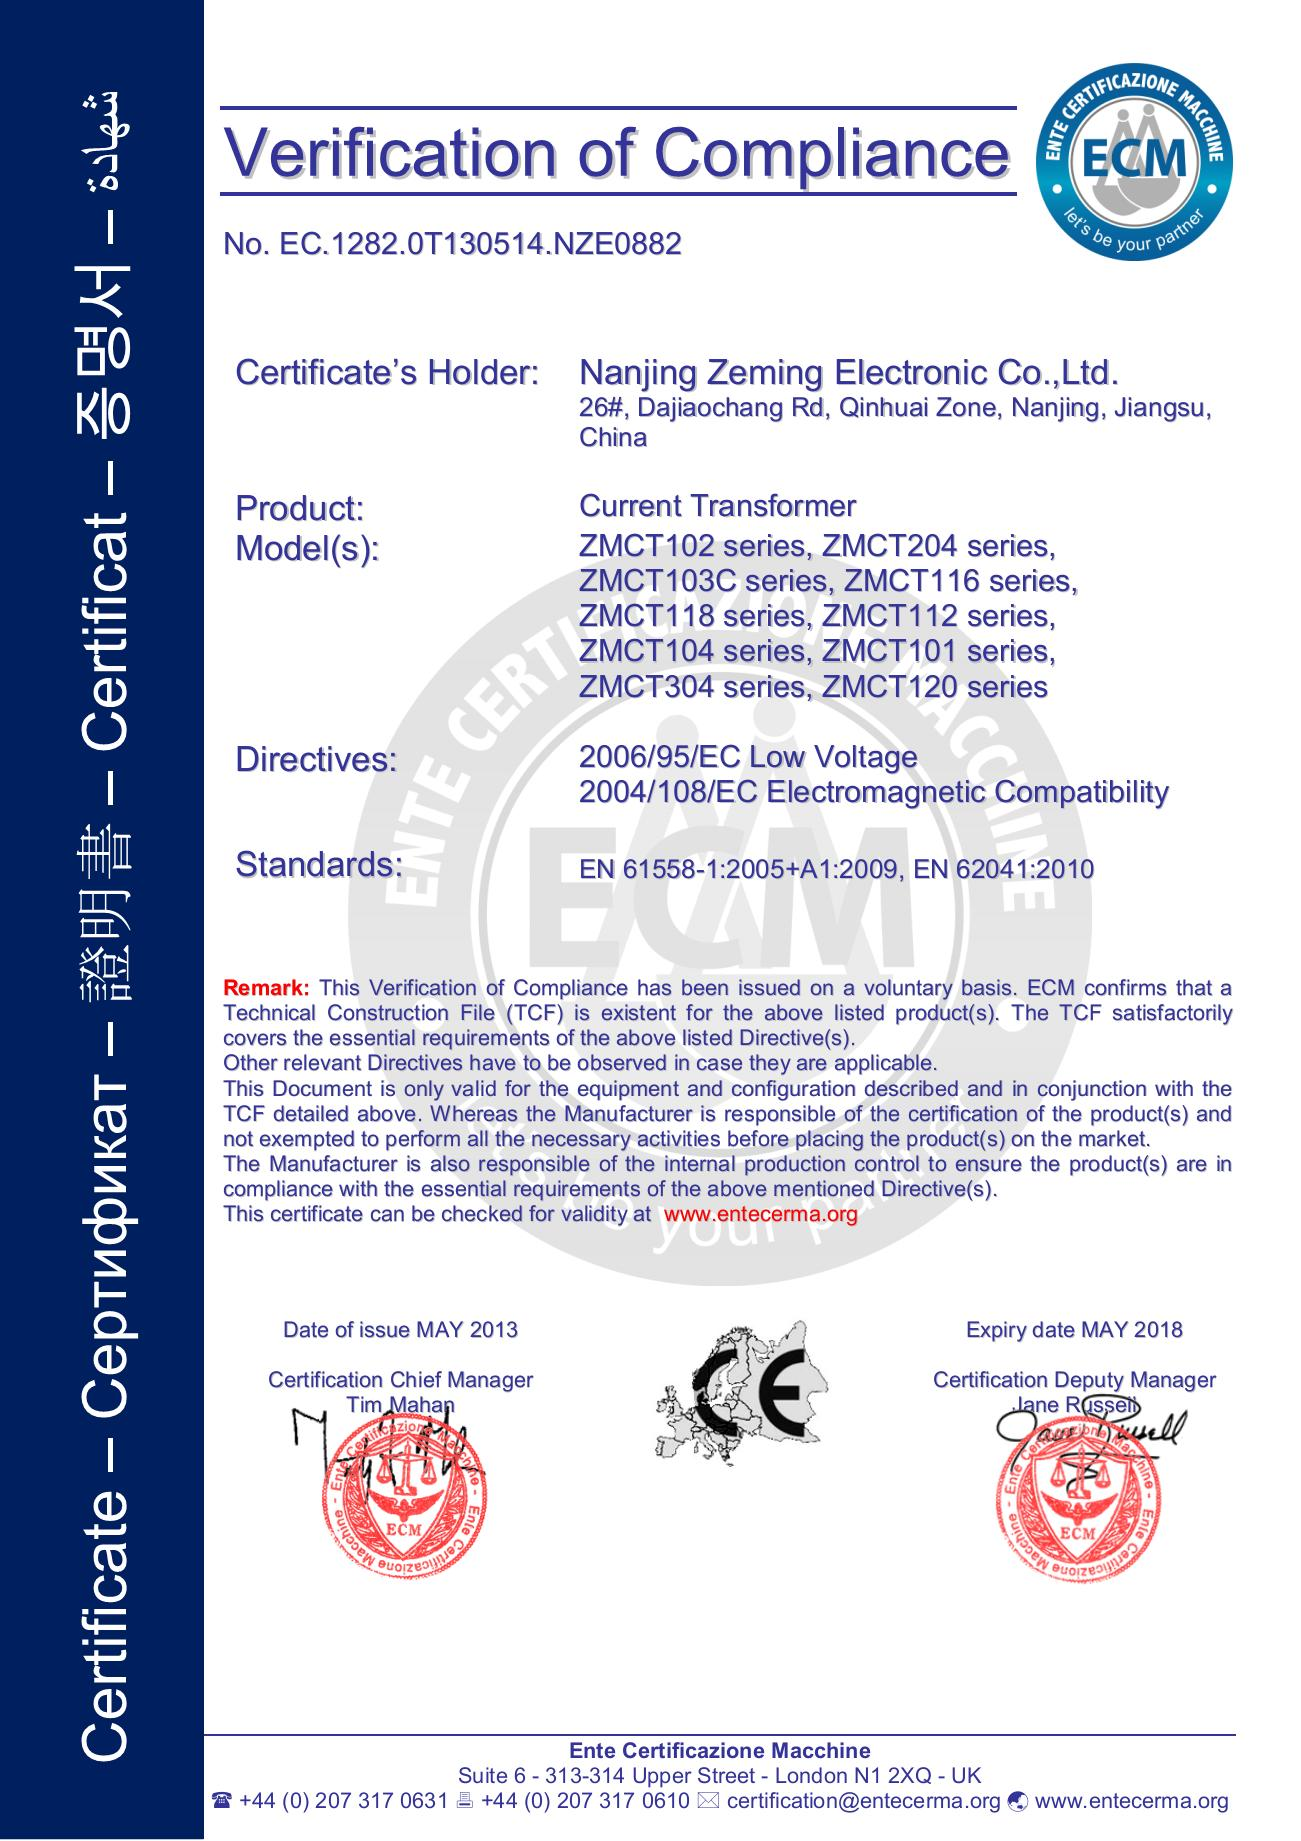 ce certification ecm verification china electronic zeming transformer certificates current complance nanjing electronics ltd